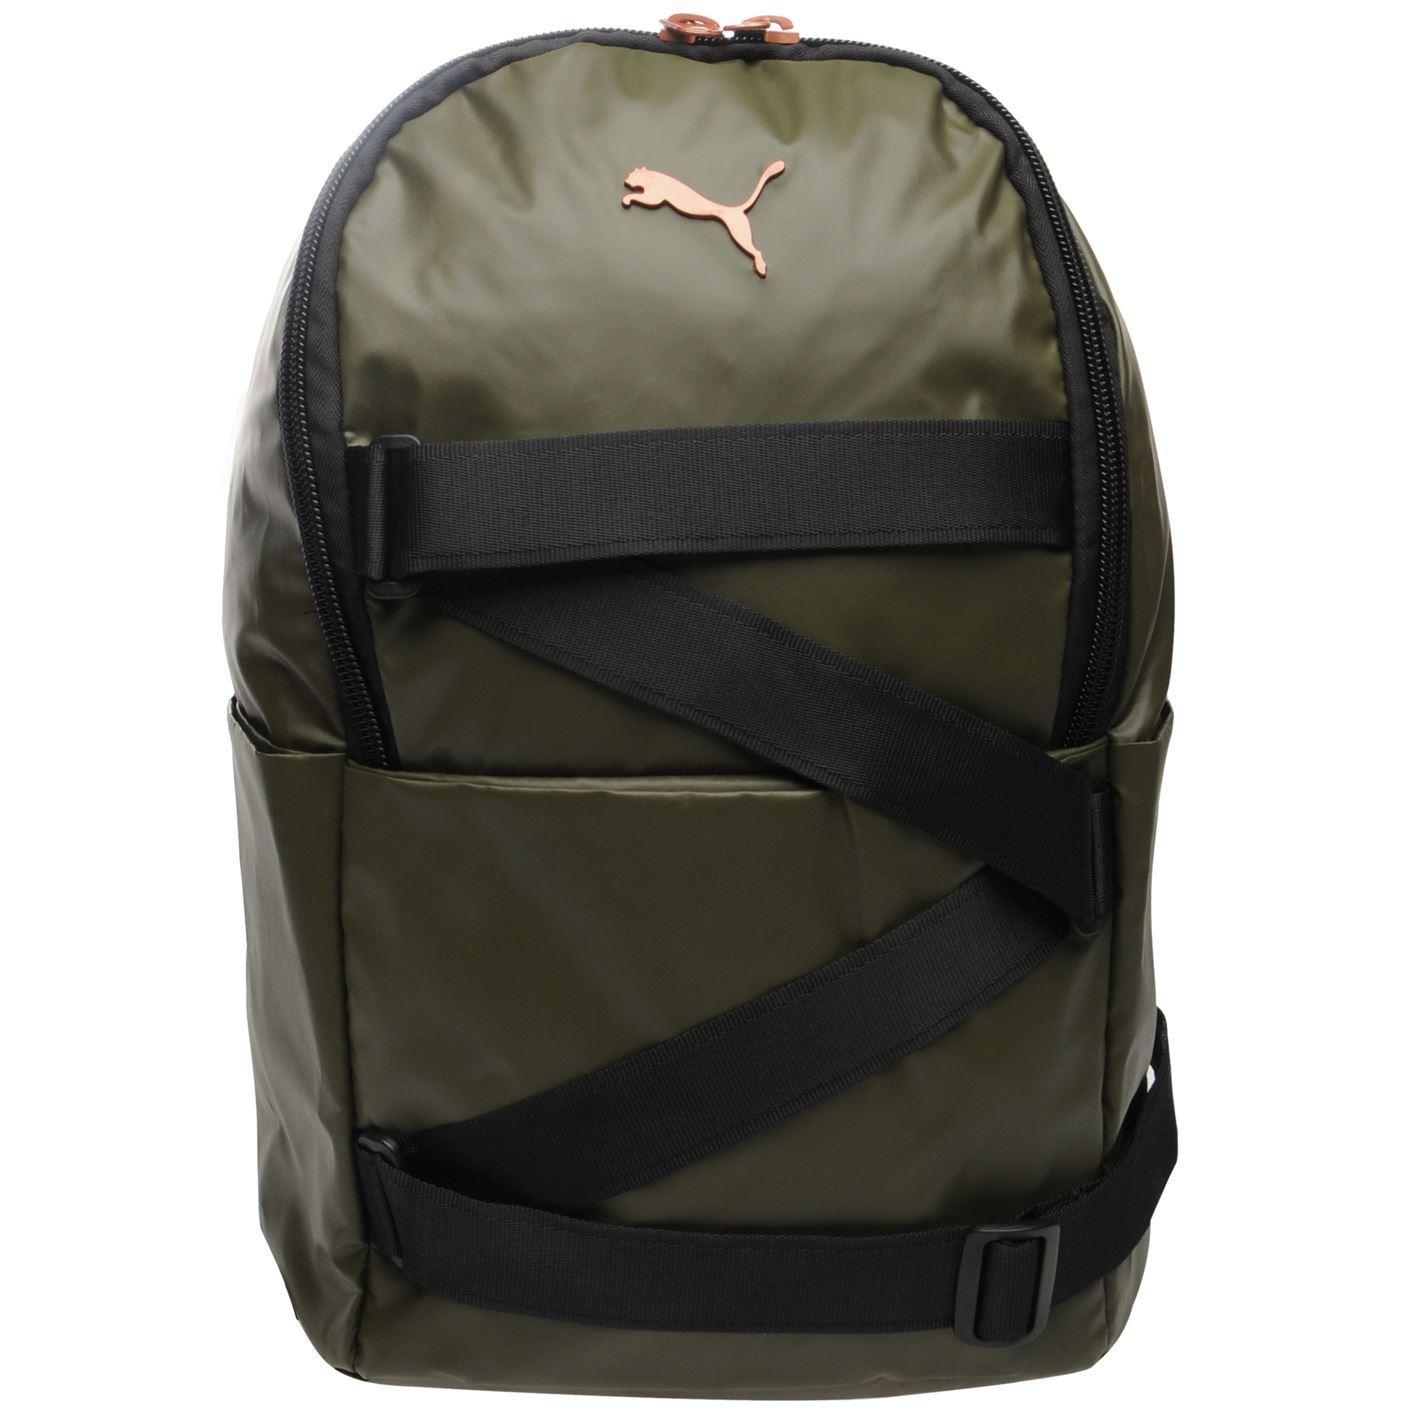 3c55dbcba166 ... Puma VR Barrel Bag Olive Sports Kit Holdall Carryall Gymbag